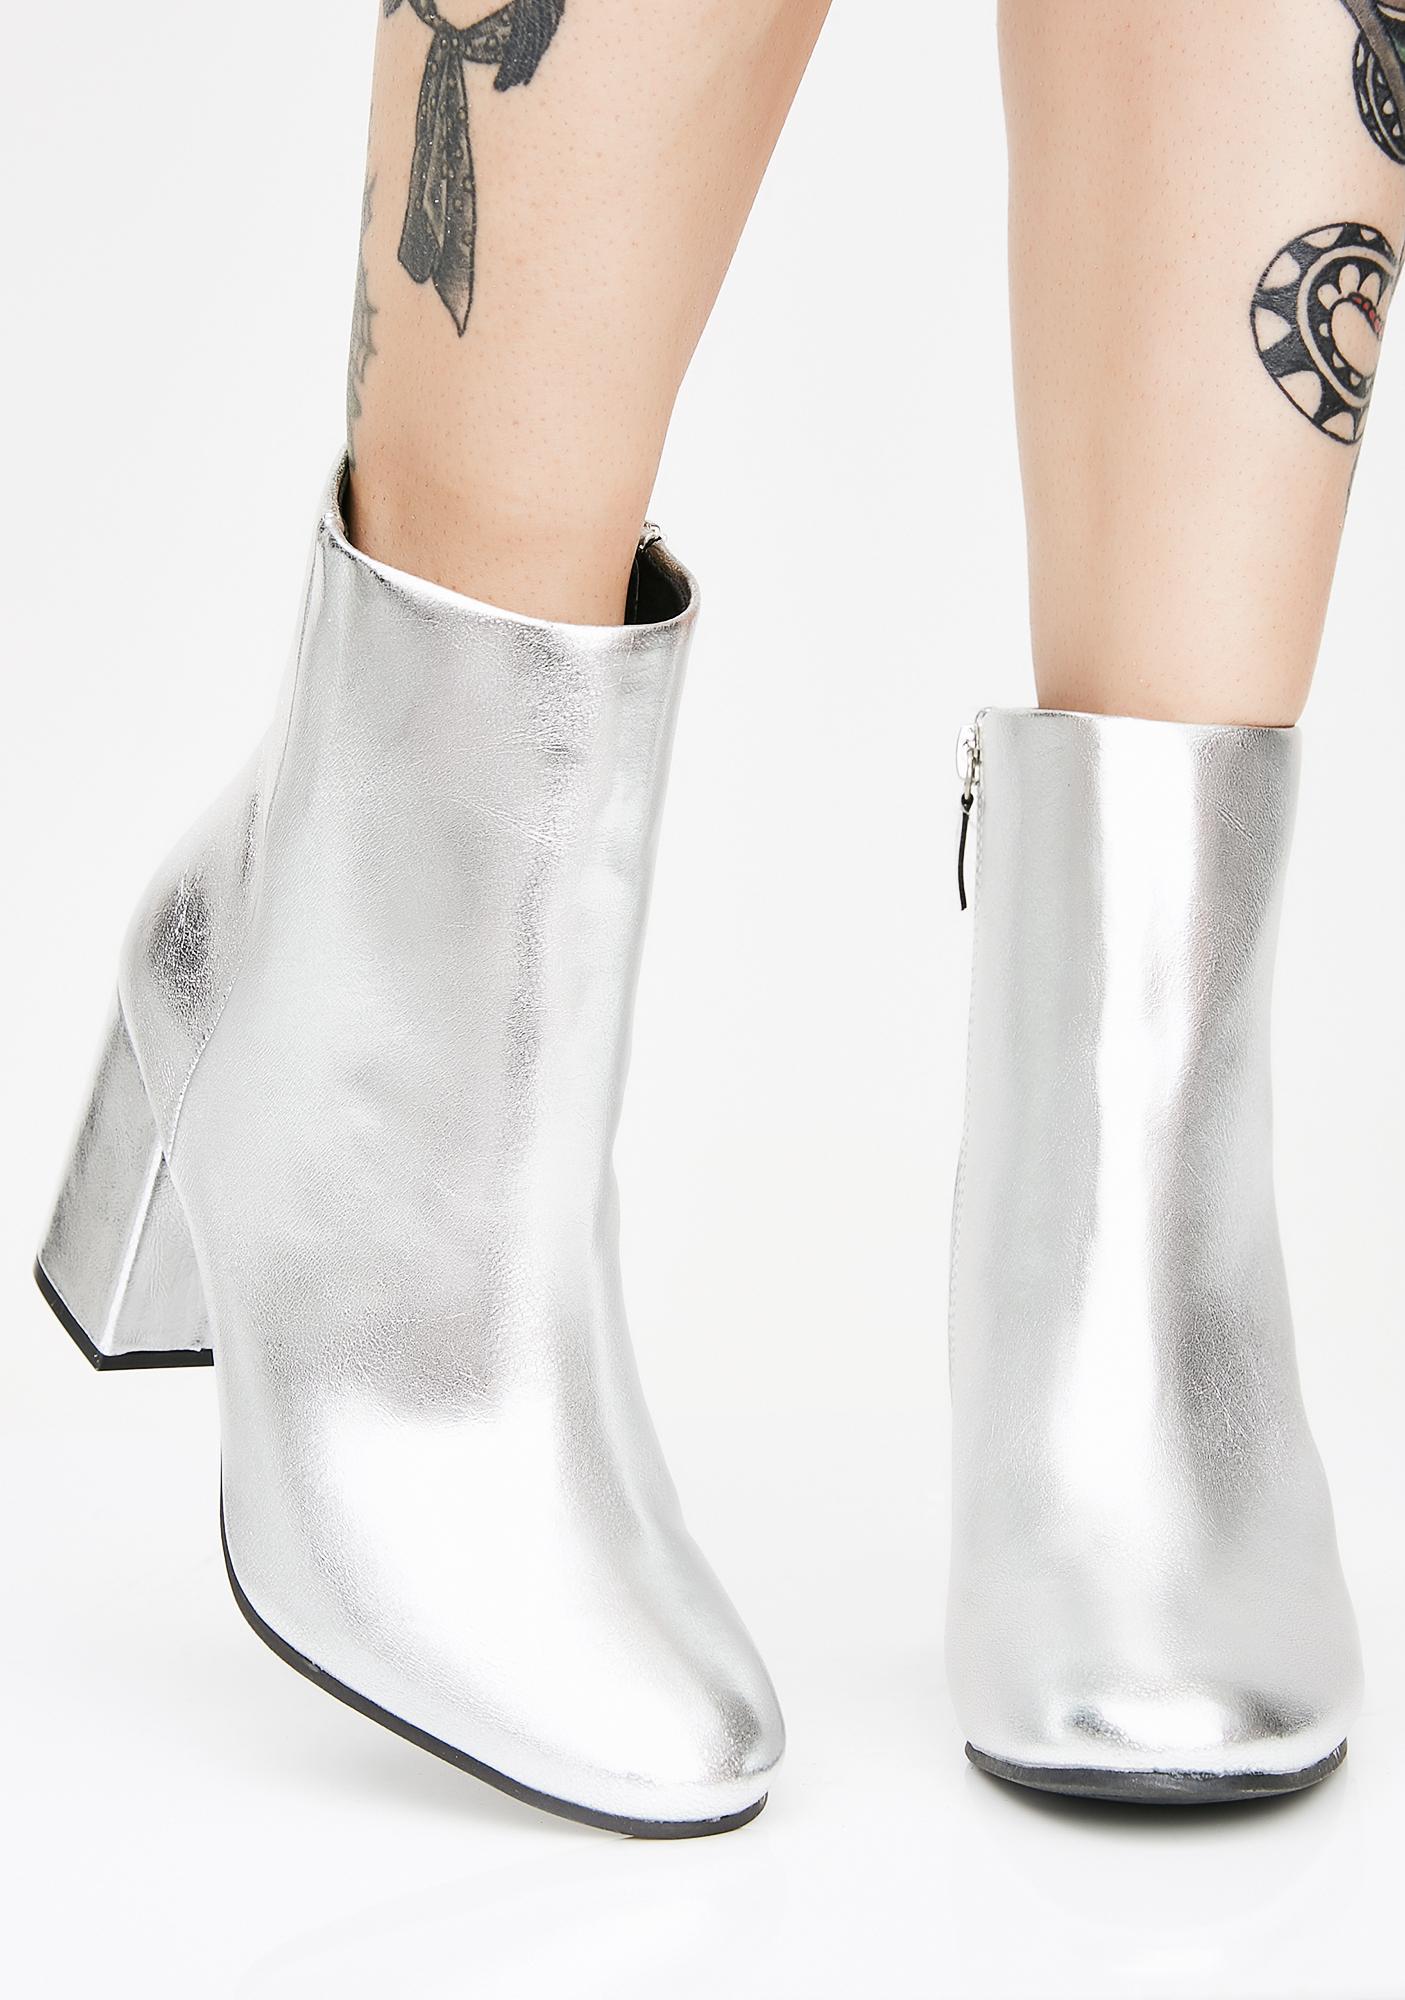 Platinum Pretty Bish Ankle Boots